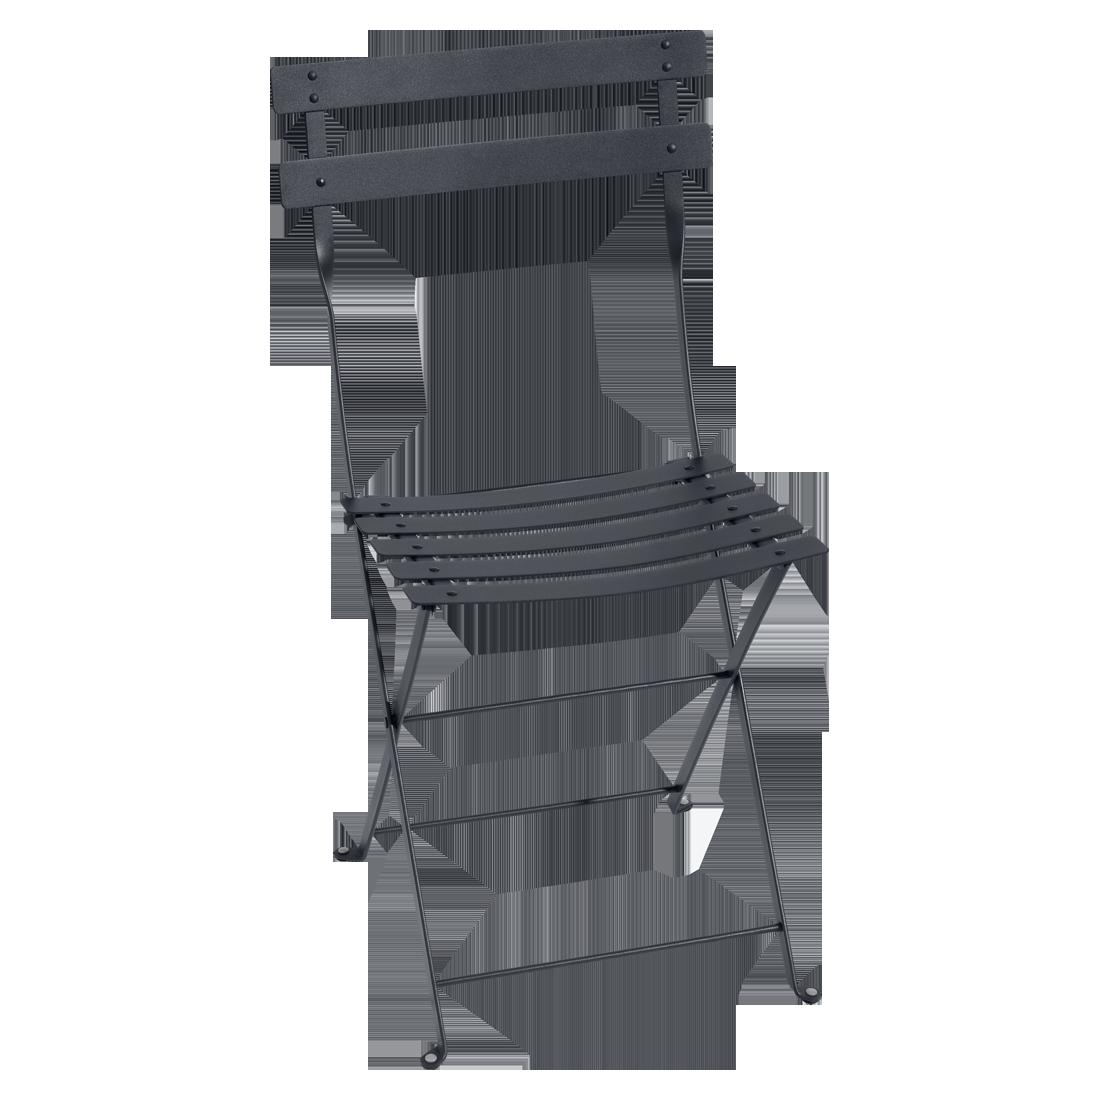 chaise bistro m tal de fermob carbone. Black Bedroom Furniture Sets. Home Design Ideas